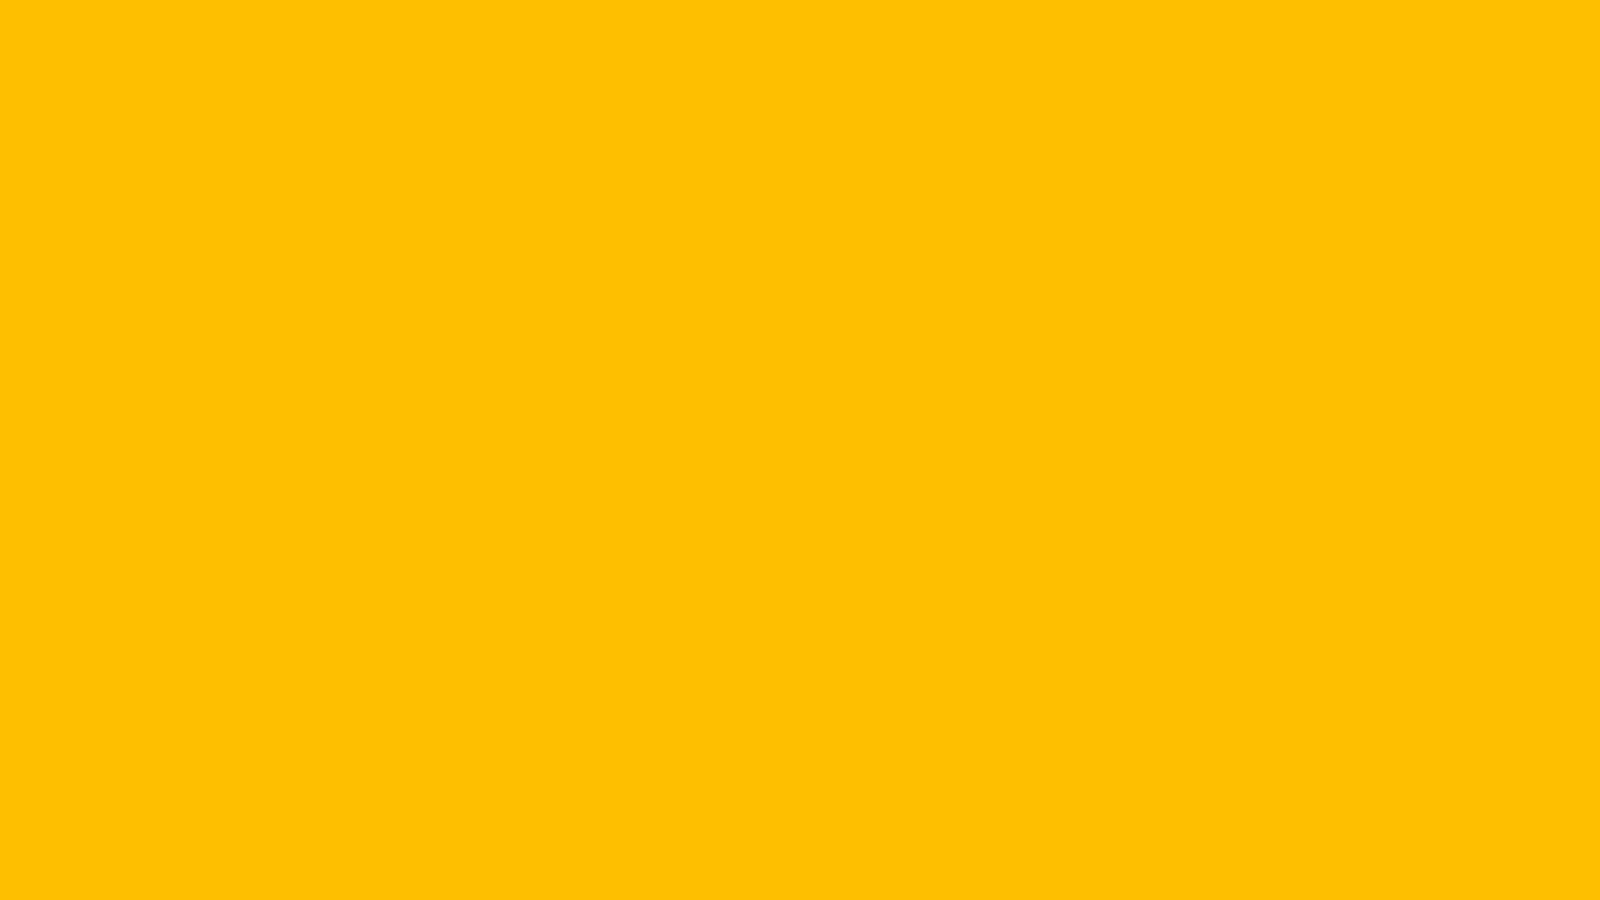 1600x900 Fluorescent Orange Solid Color Background